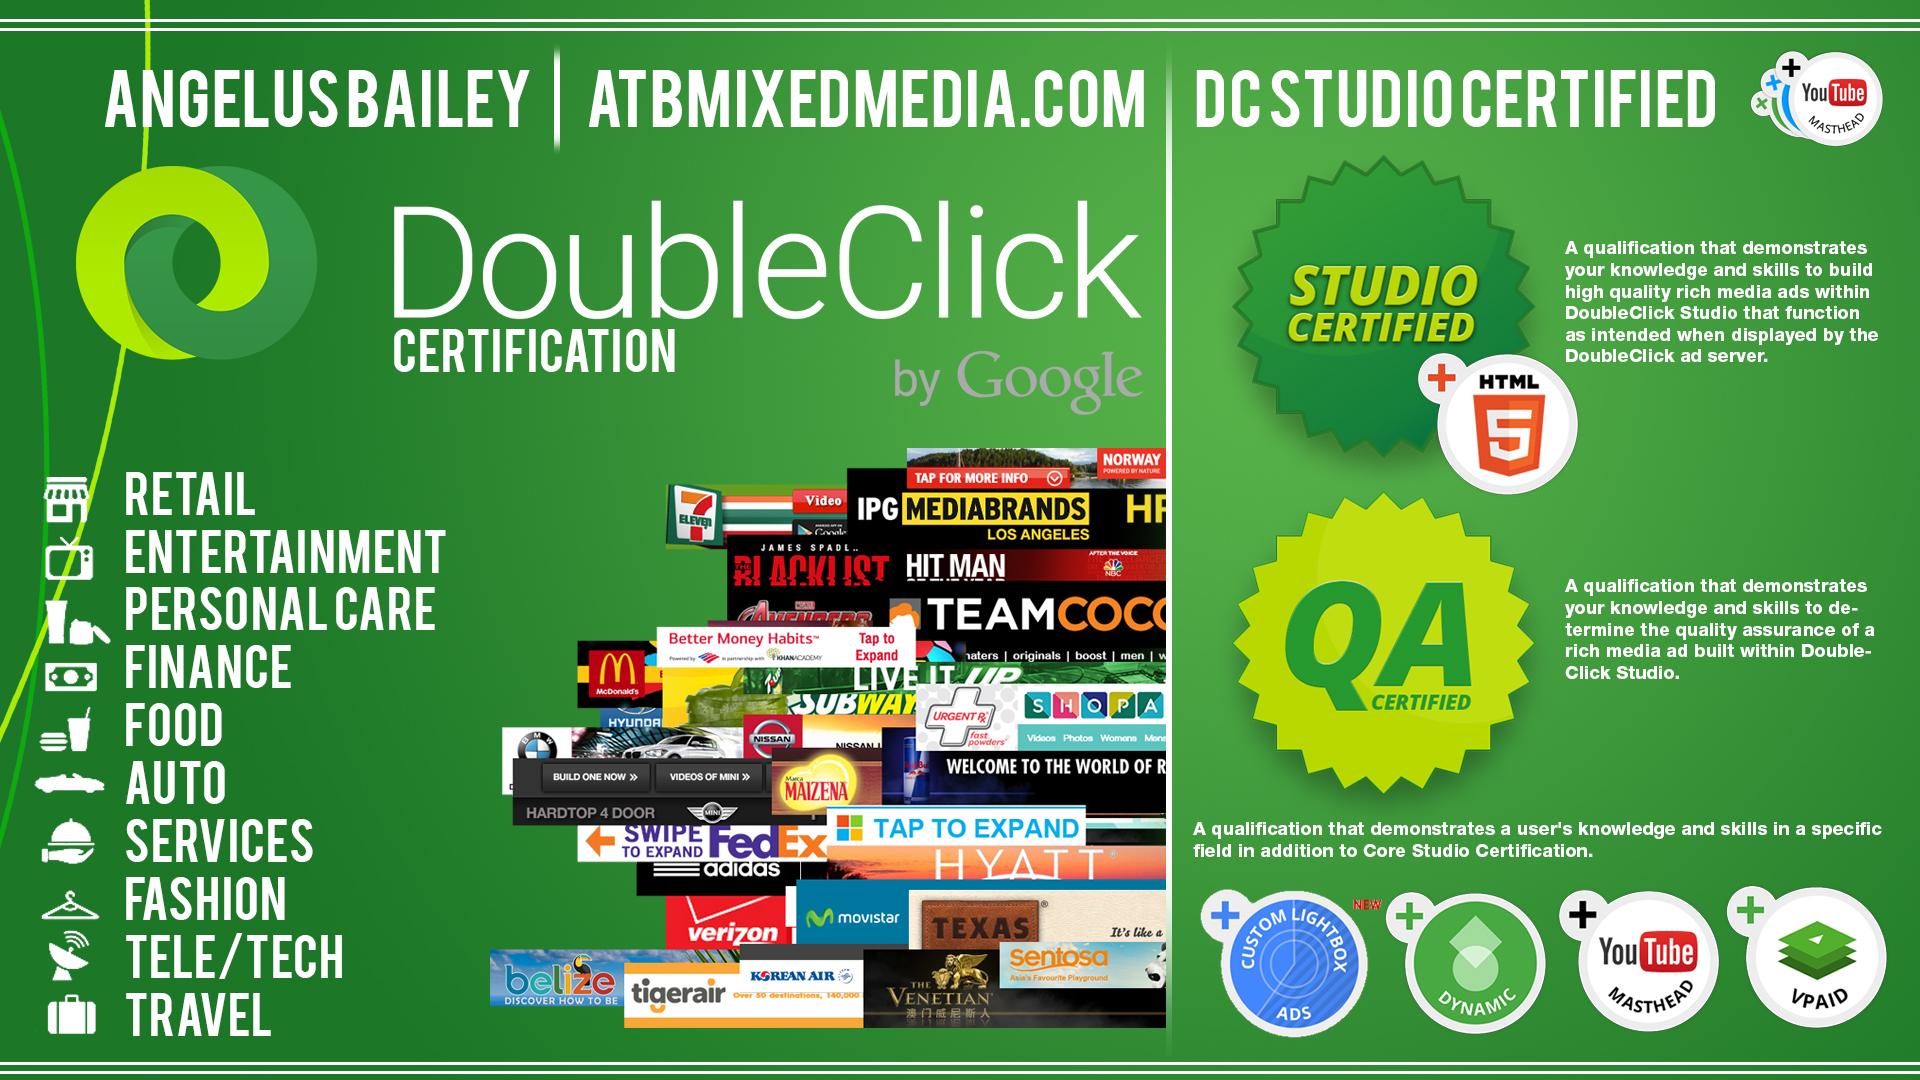 Angelus_Bailey_Certification_Pg_1